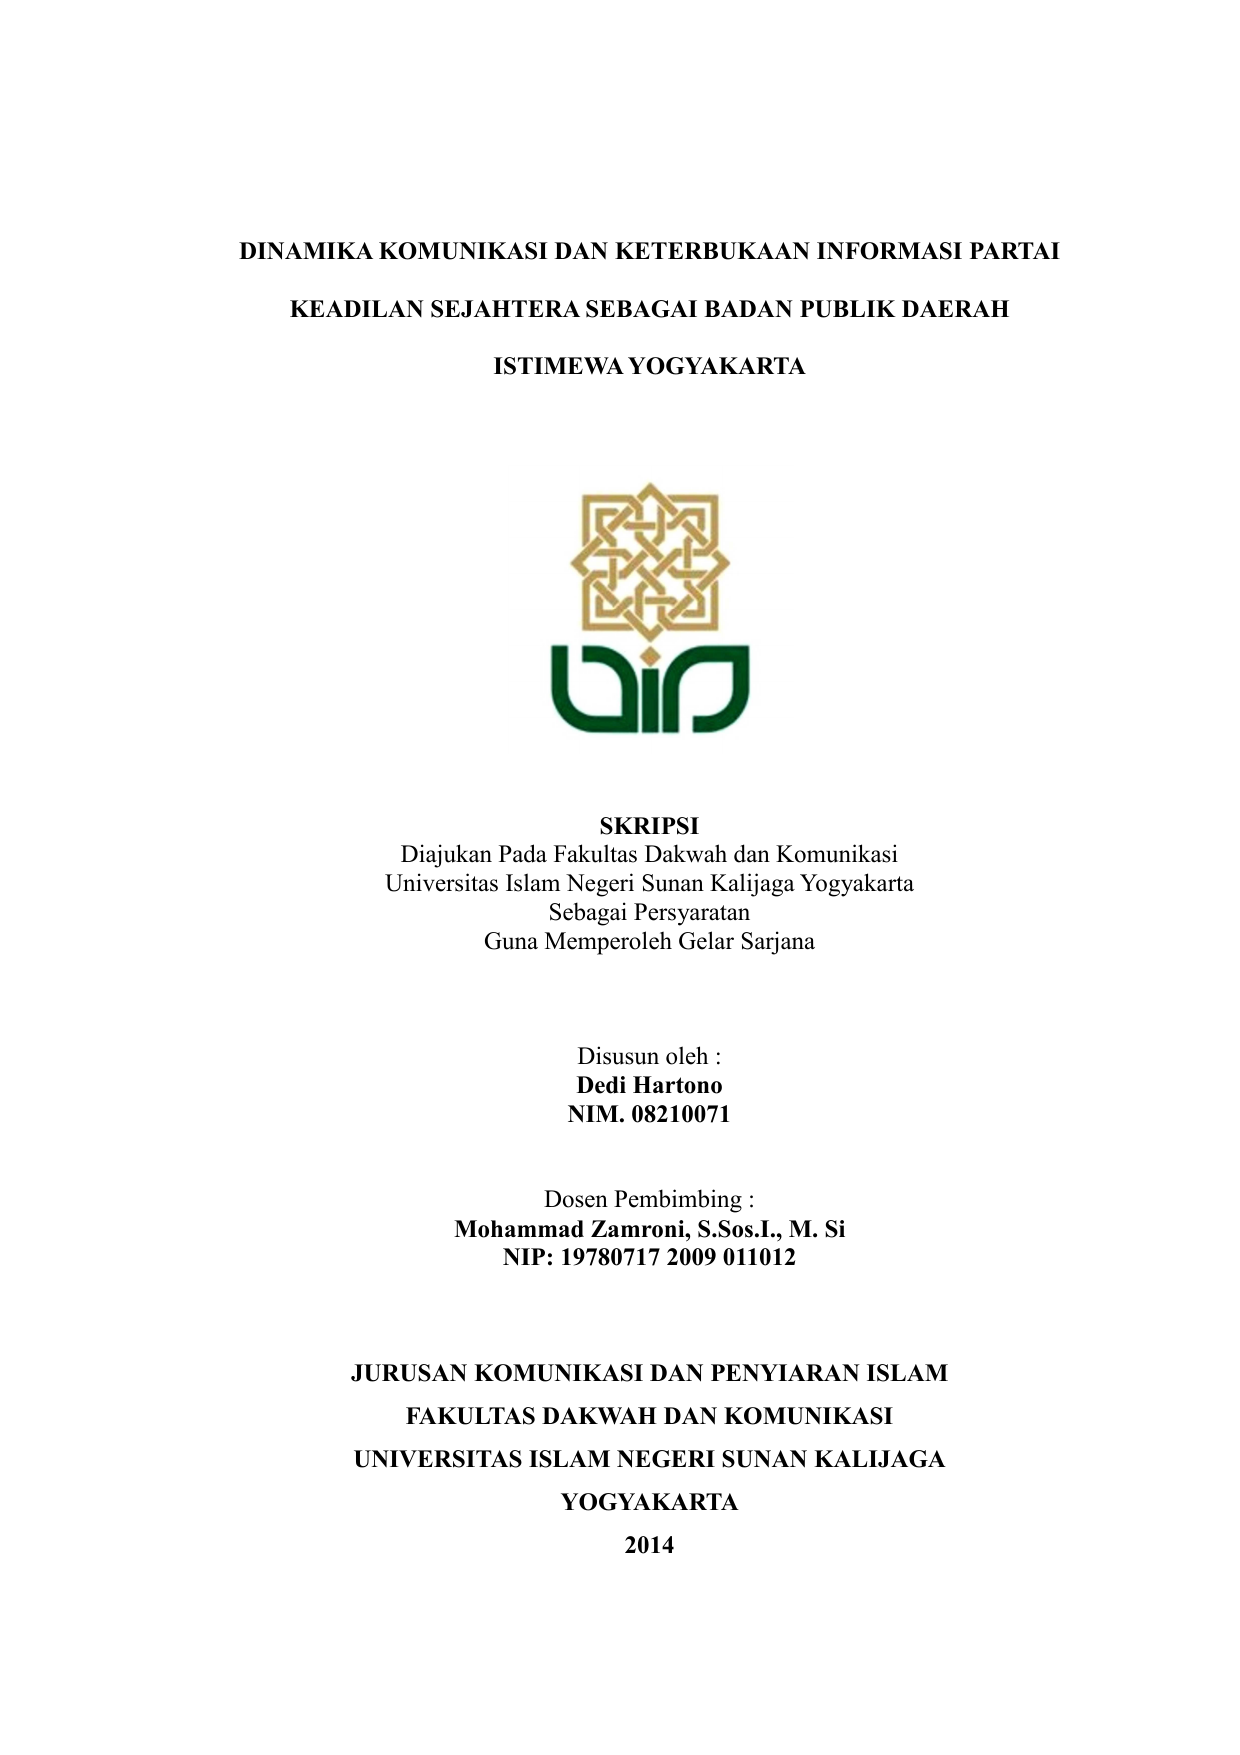 Cover Proposal Digital Library Uin Sunan Kalijaga